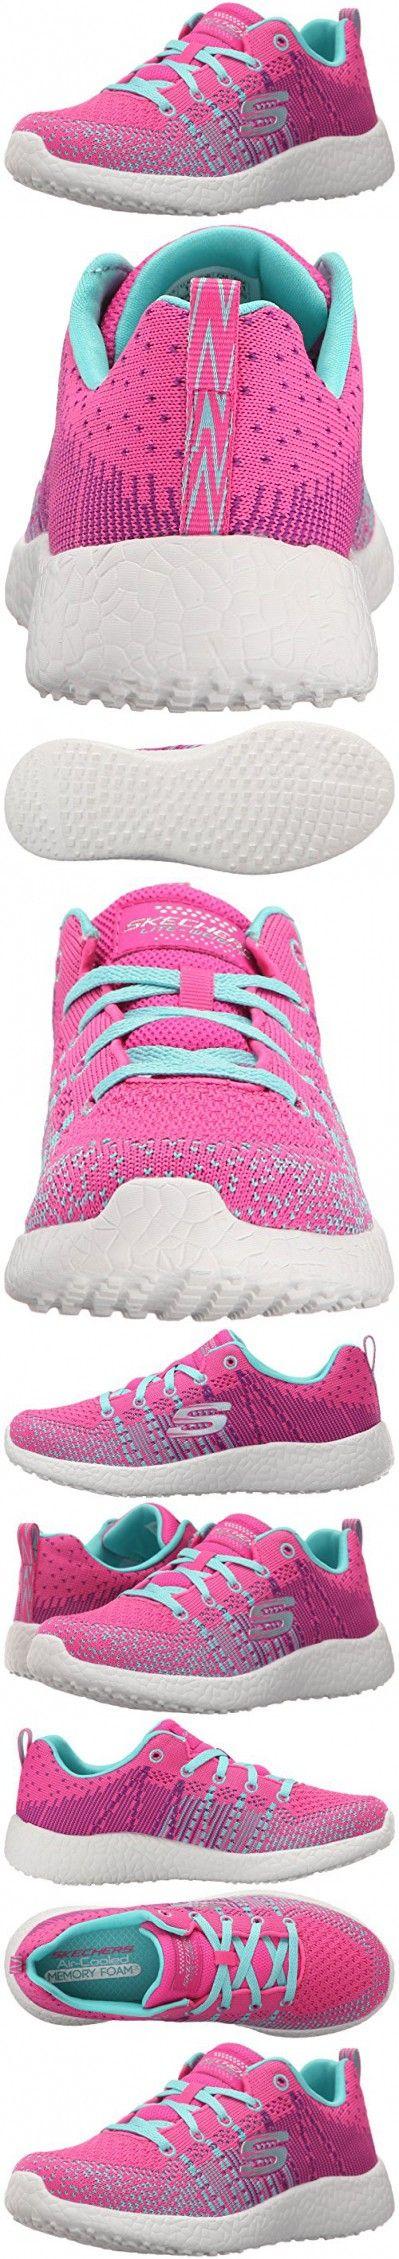 Skechers Kids Burst Ellipse Sneaker (Little Kid/Big Kid), Neon Pink/Turquoise, 2 M US Little Kid